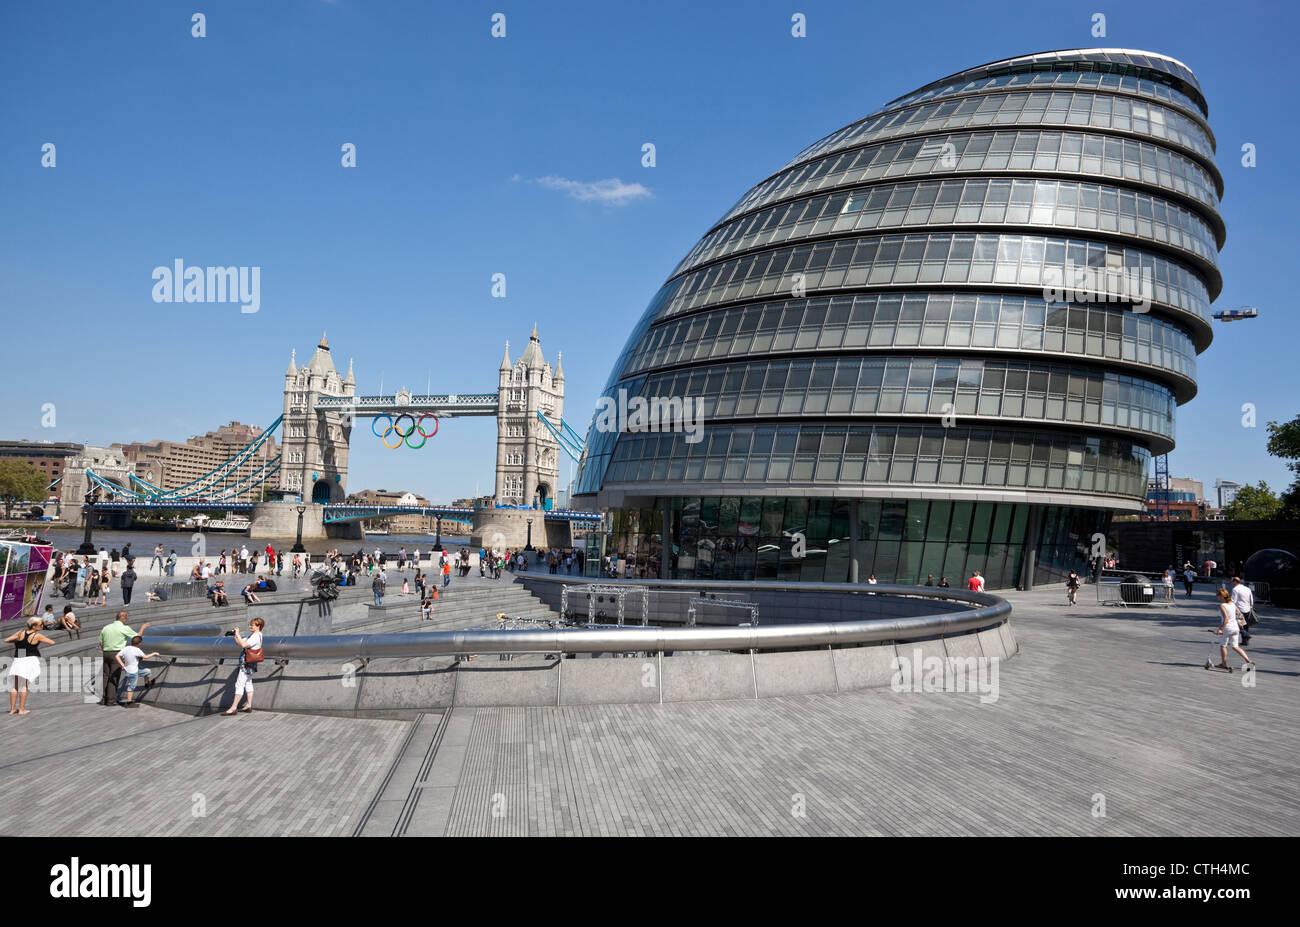 London City Hall and Tower Bridge in the background, Borough of Southwark, London, SE1, England, UK. - Stock Image